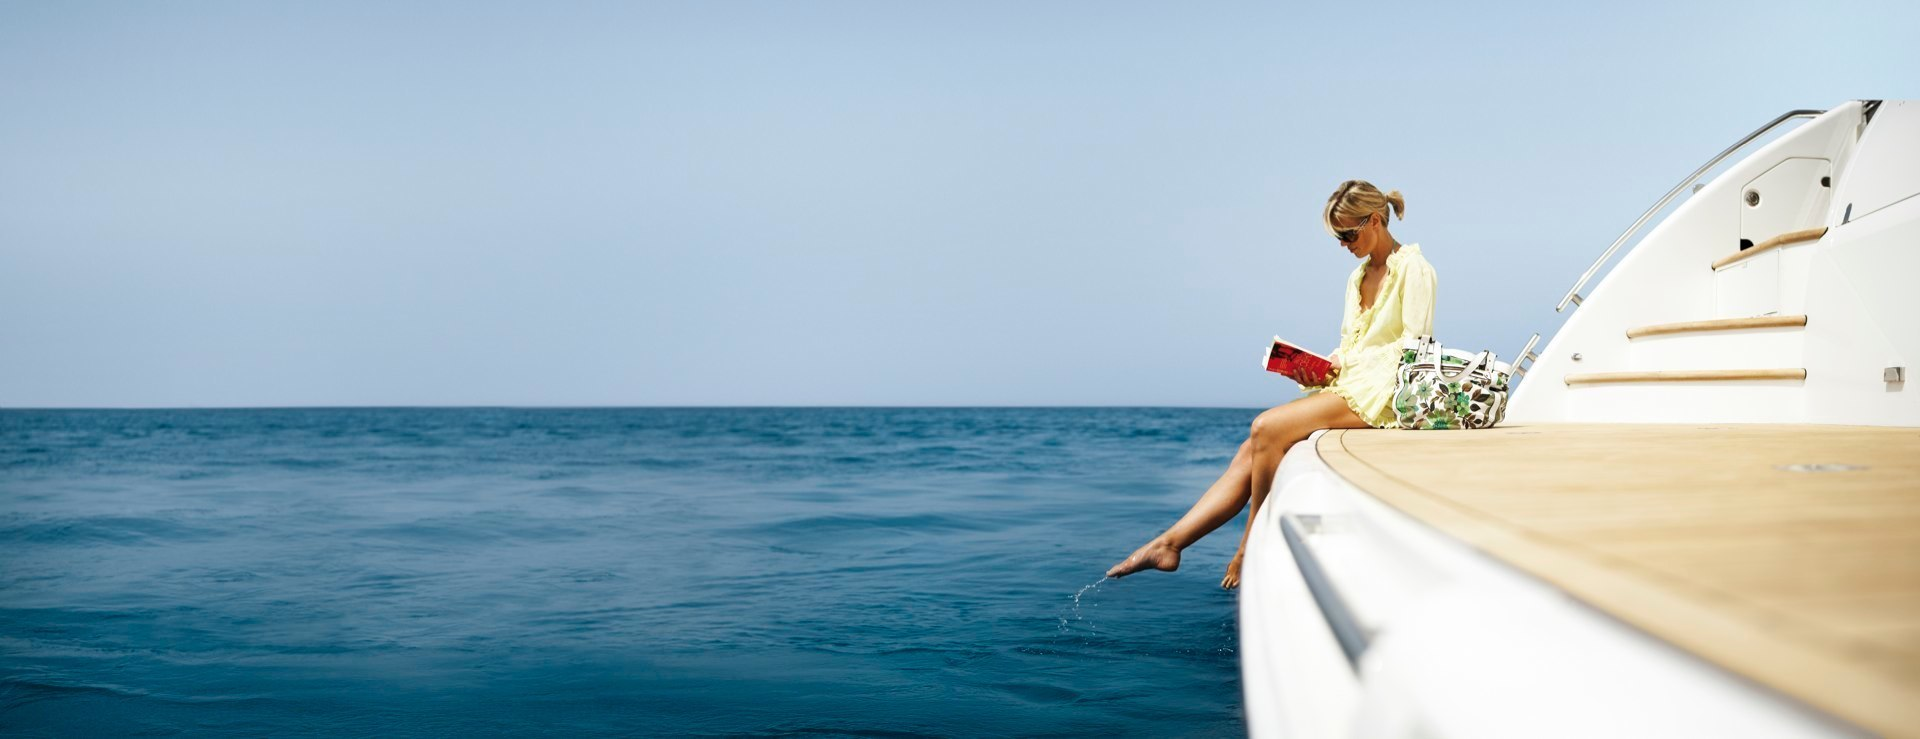 Antropoti-Yachts-girl-yacht